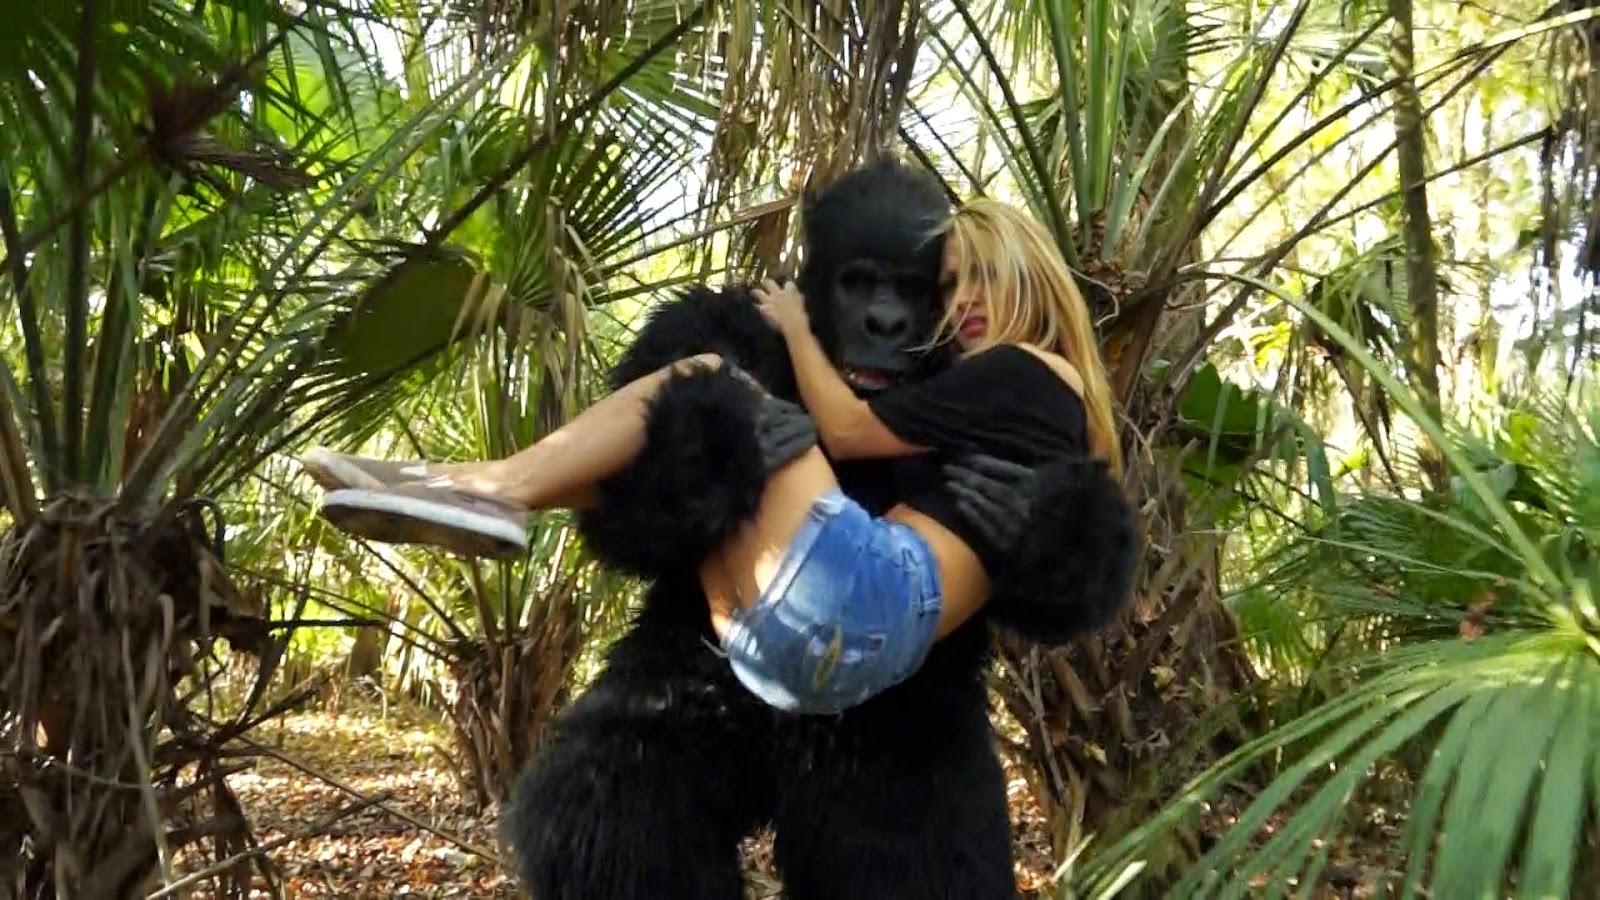 Bokep jepang gorila ngentot abg